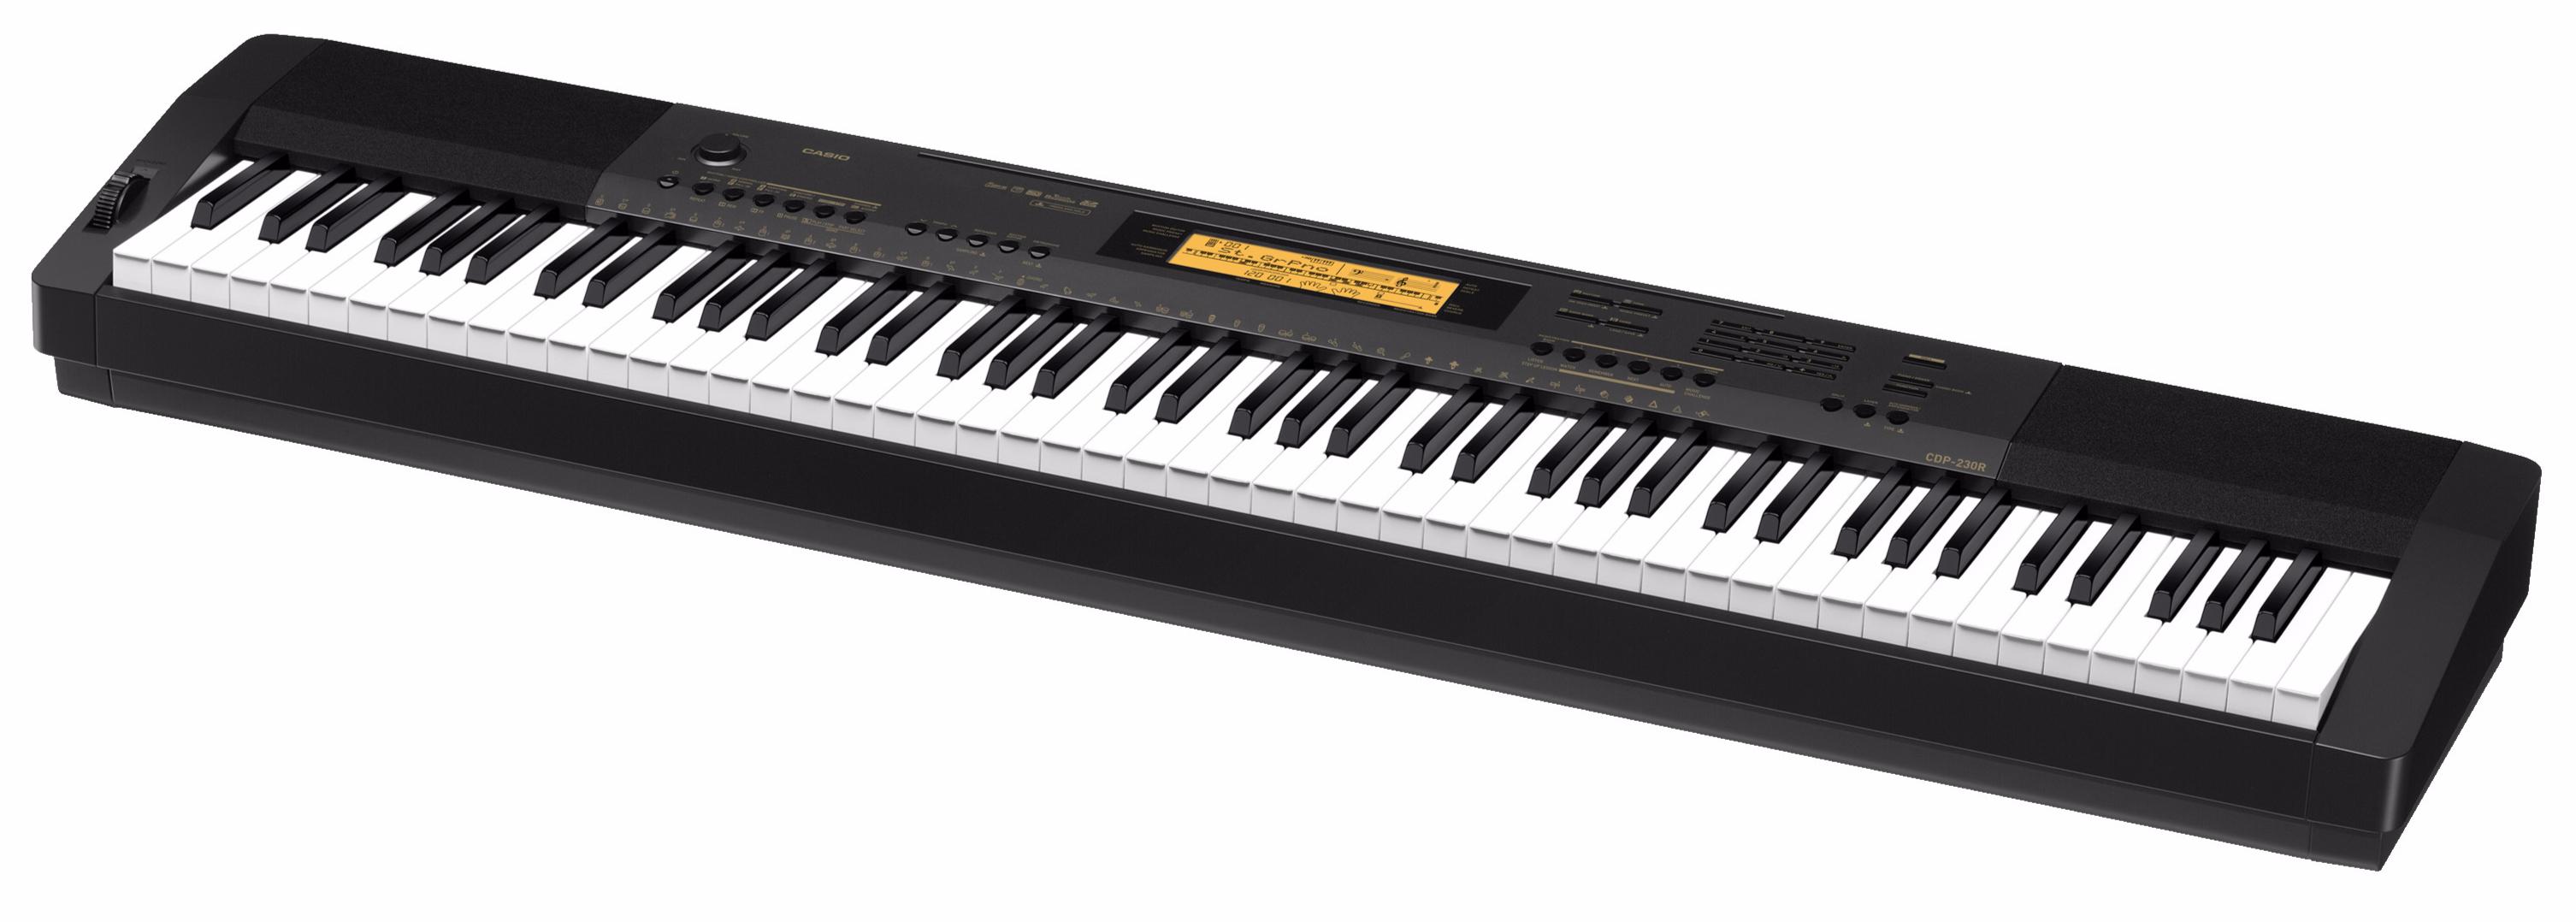 Digital Piano Casio Cdp 230 : casio cdp 230 r bk digital piano schwarz ~ Vivirlamusica.com Haus und Dekorationen